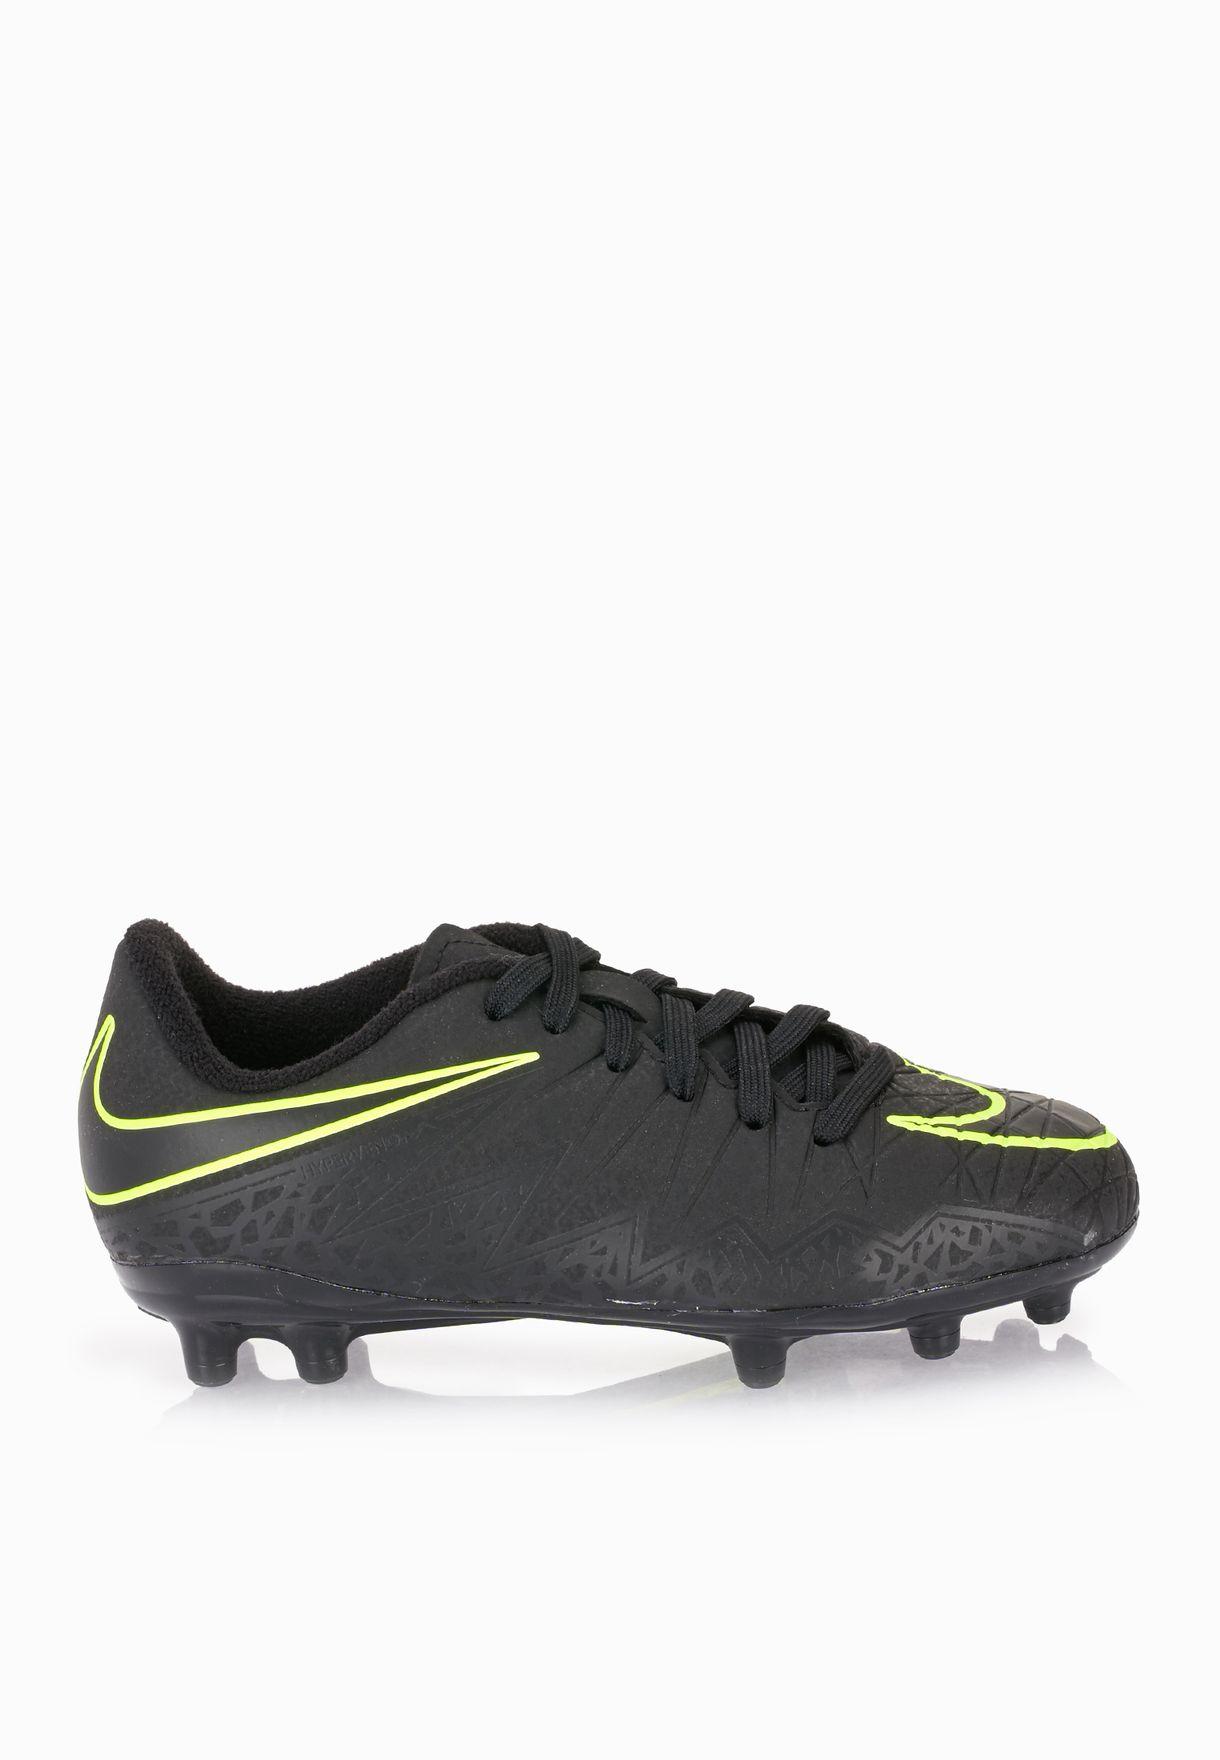 93abb15ef Shop Nike black Youth Hypervenom Phelon II 744943-009 for Kids in ...